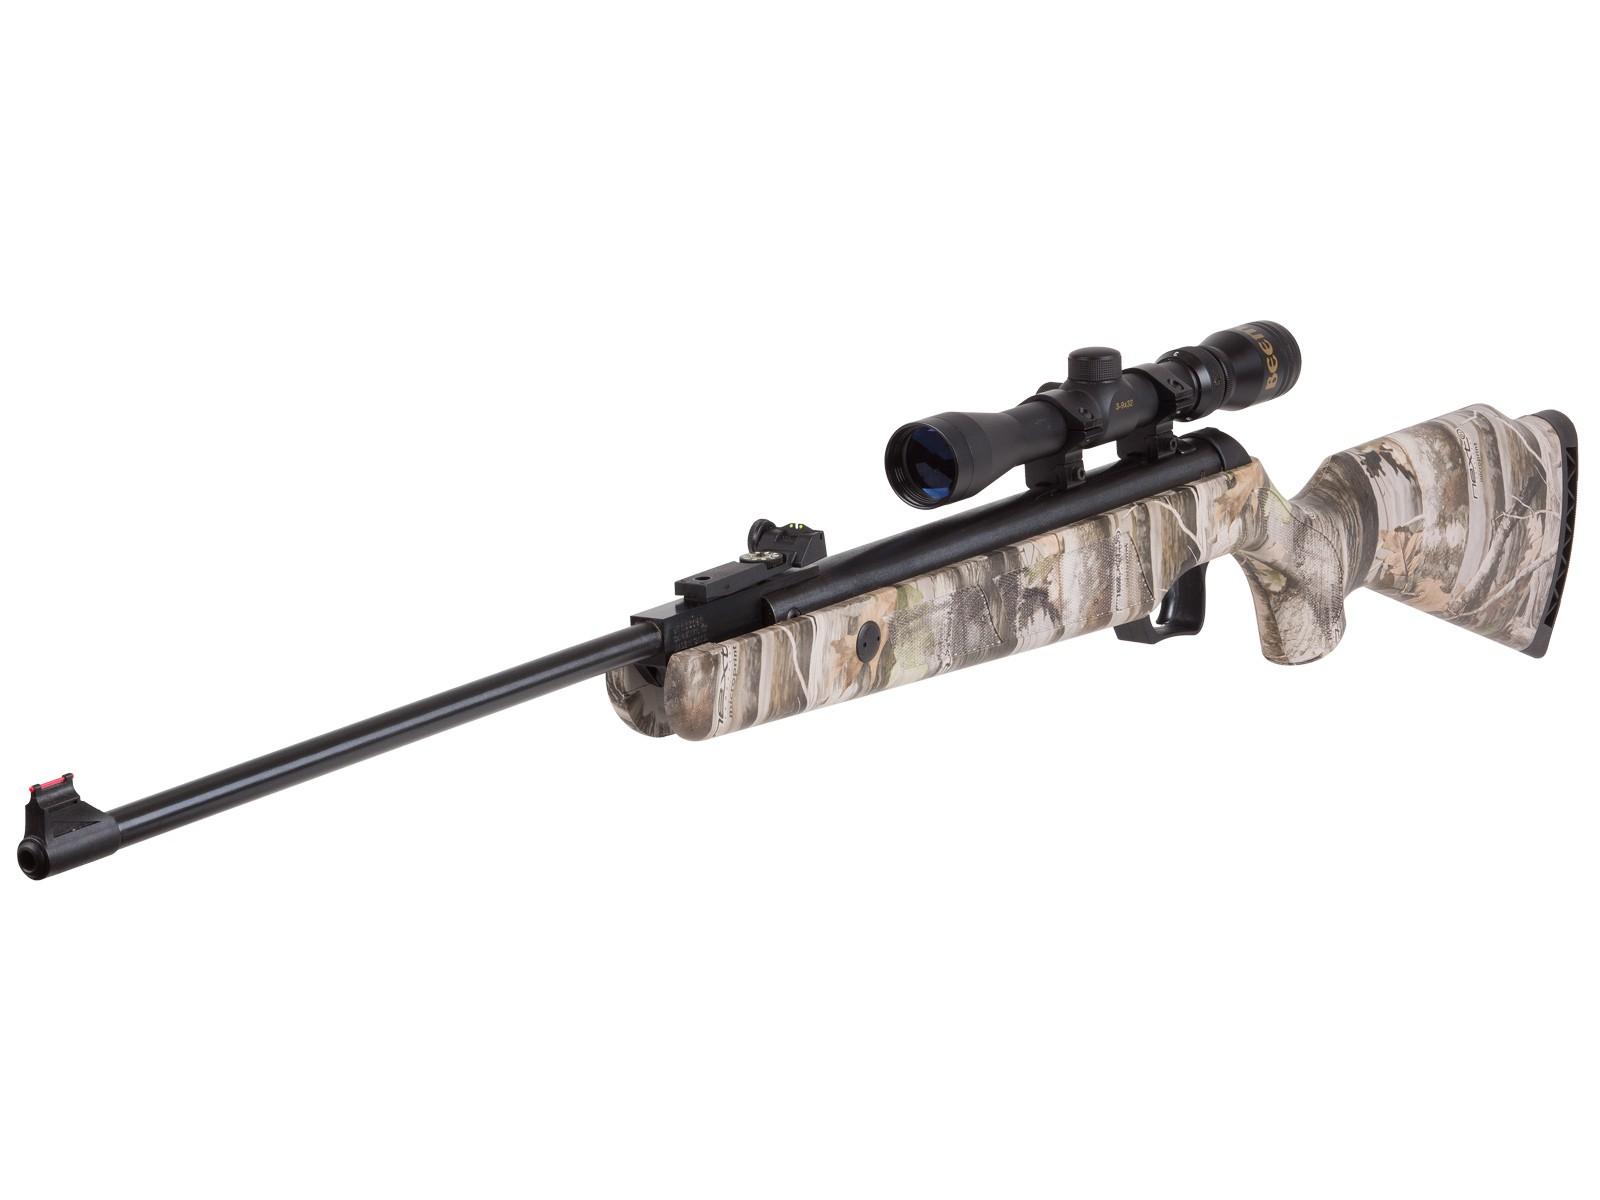 Beeman RS1 Air Rifle, Camo Stock